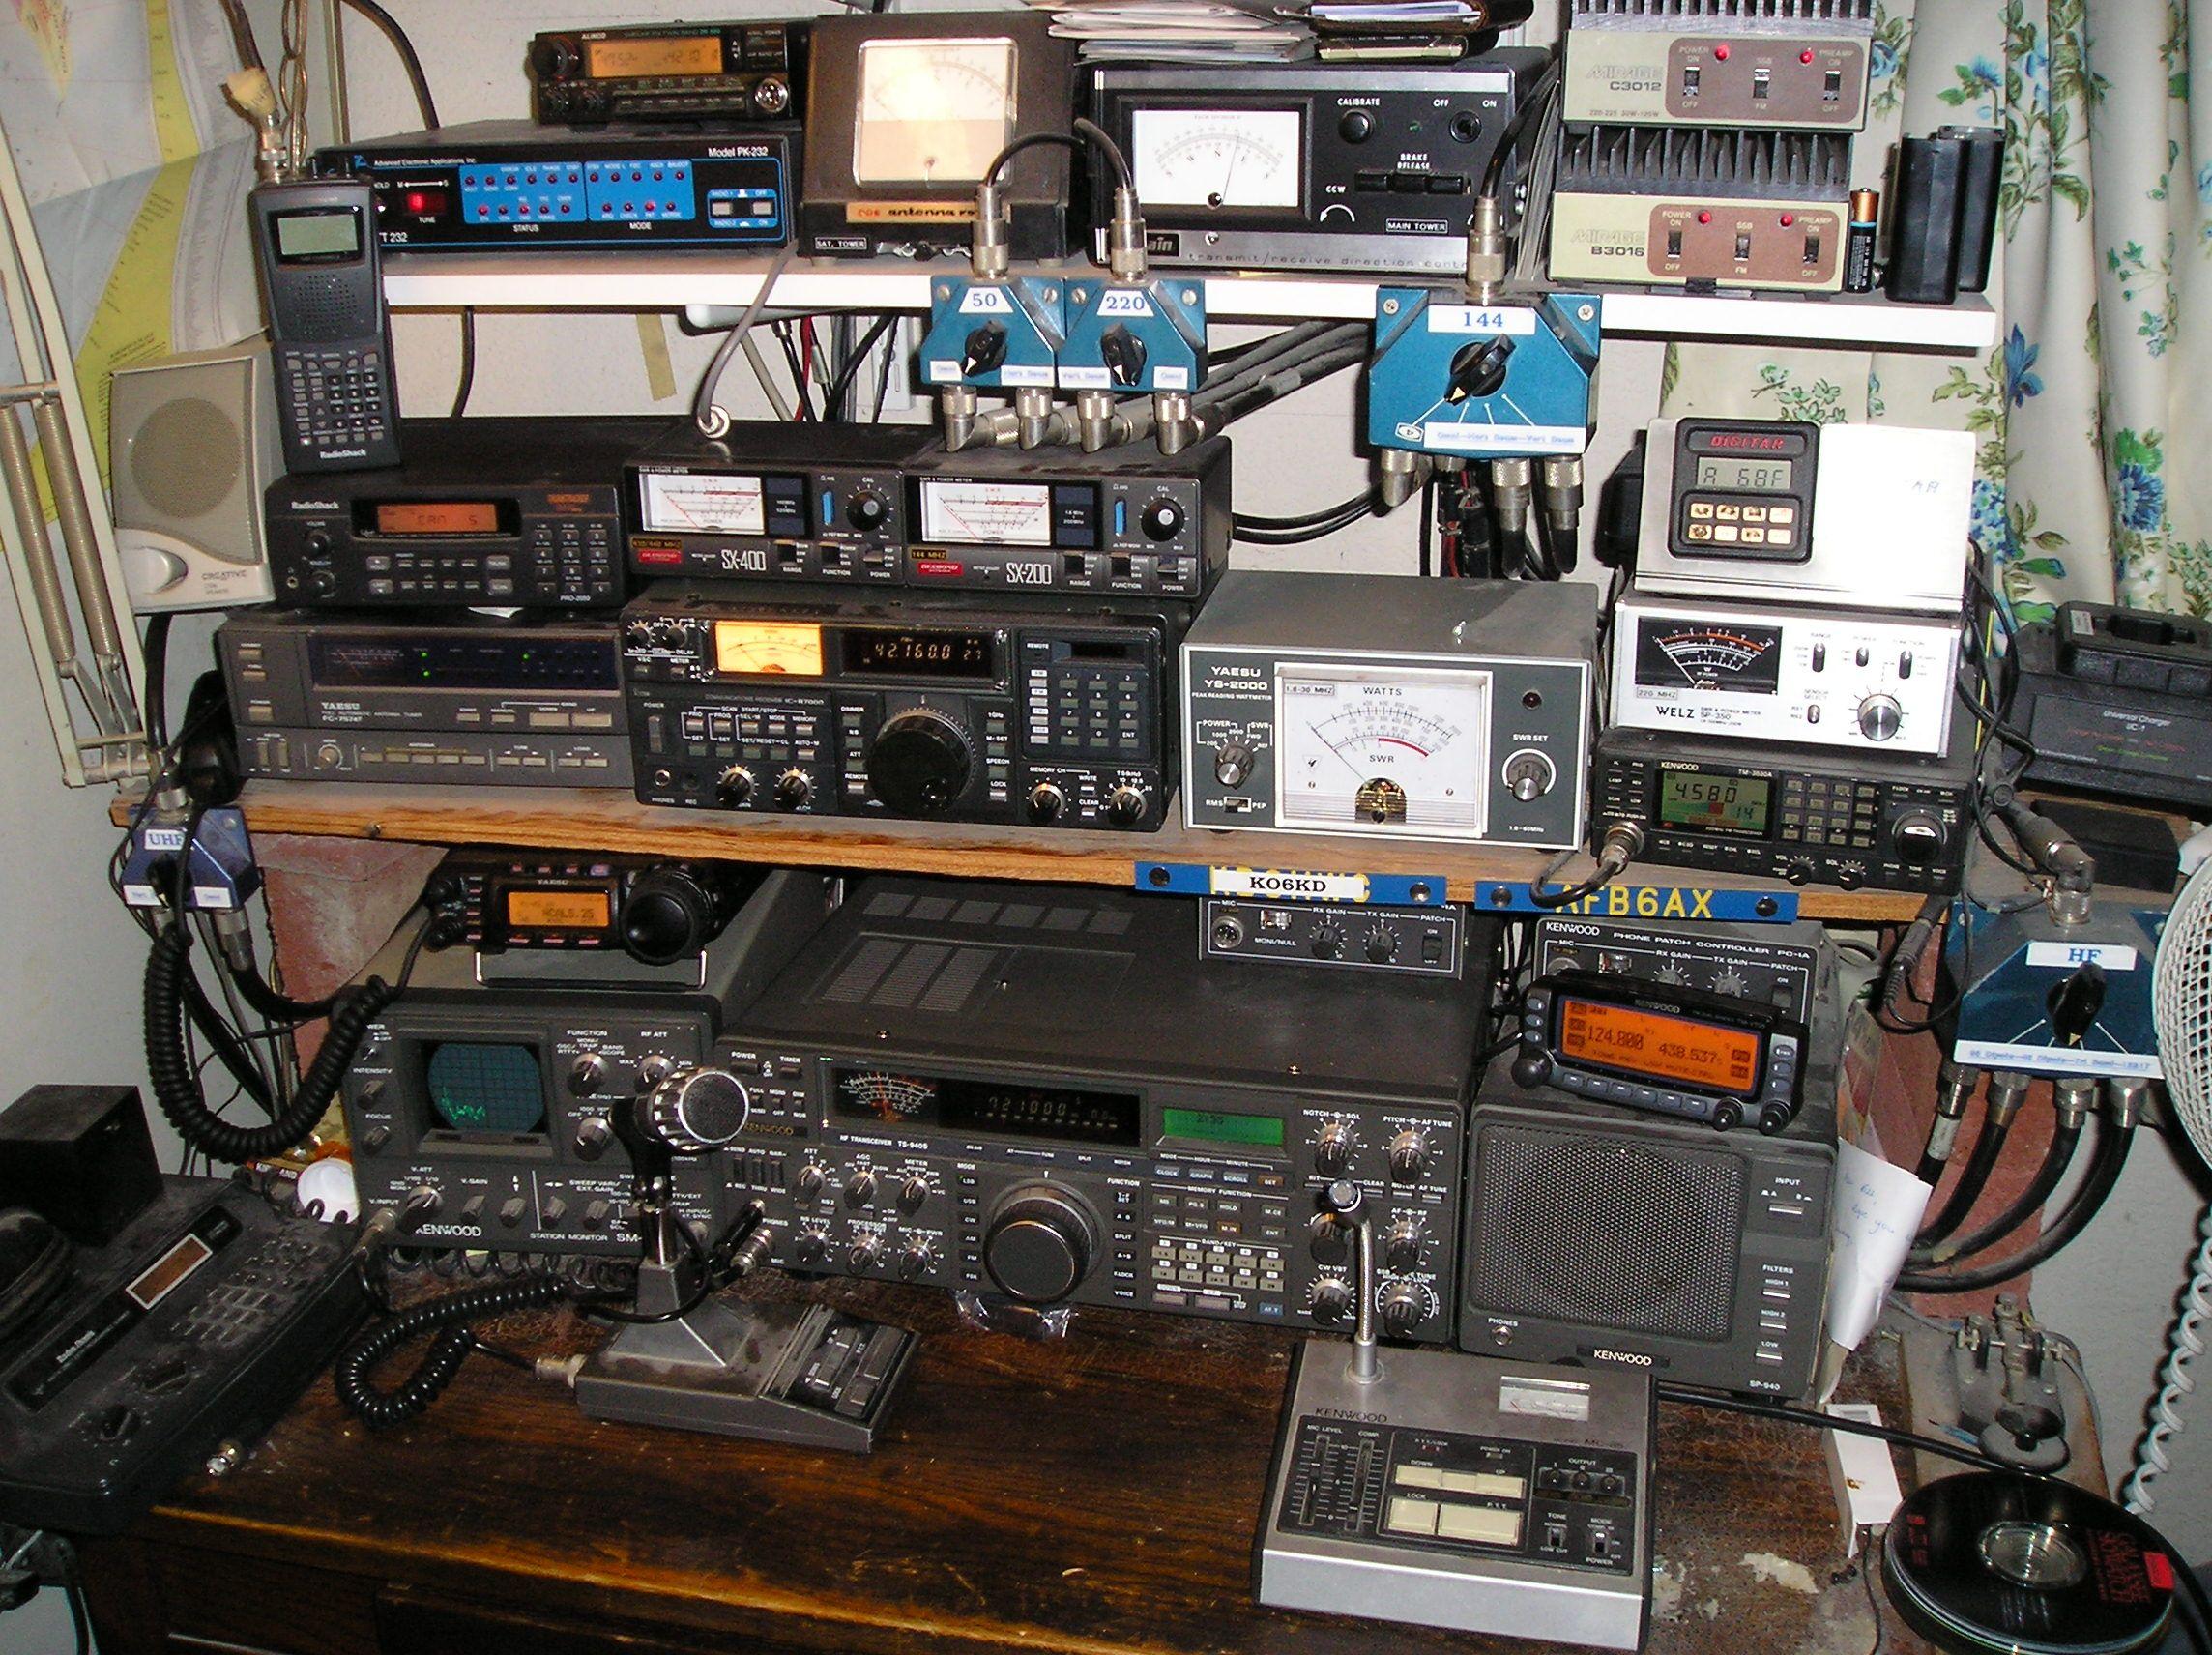 Consider, radio shack amateur radios